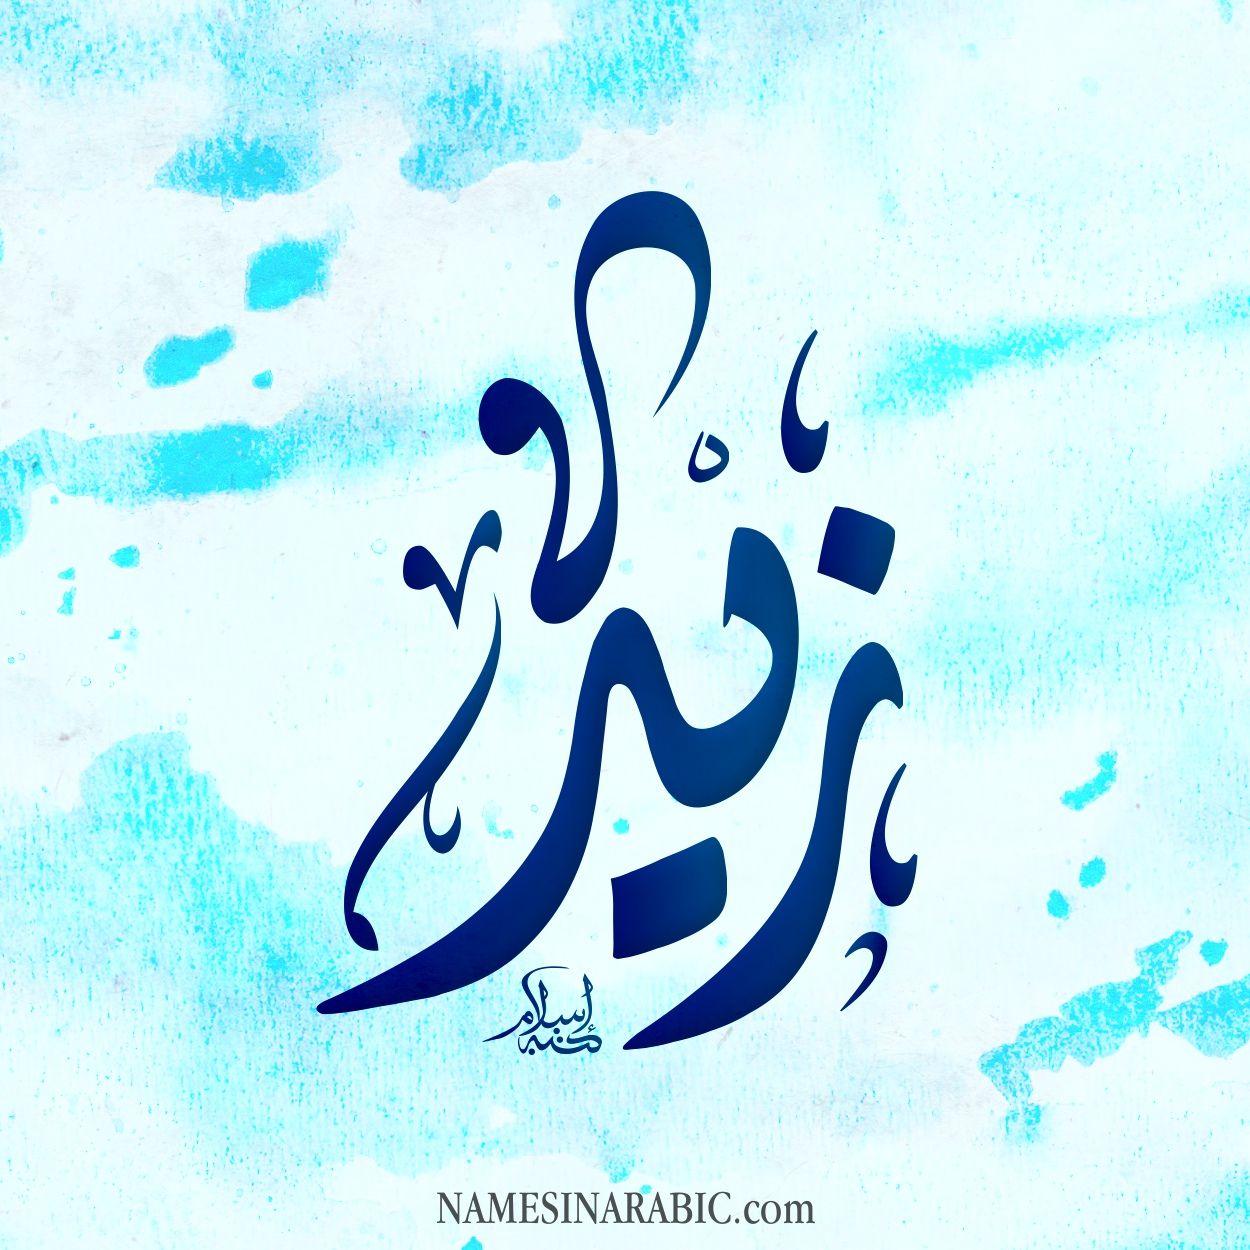 Zaid زيد Names In Arabic Calligraphy Name 4924 Calligraphy Name Arabic Calligraphy Art Arabic Calligraphy